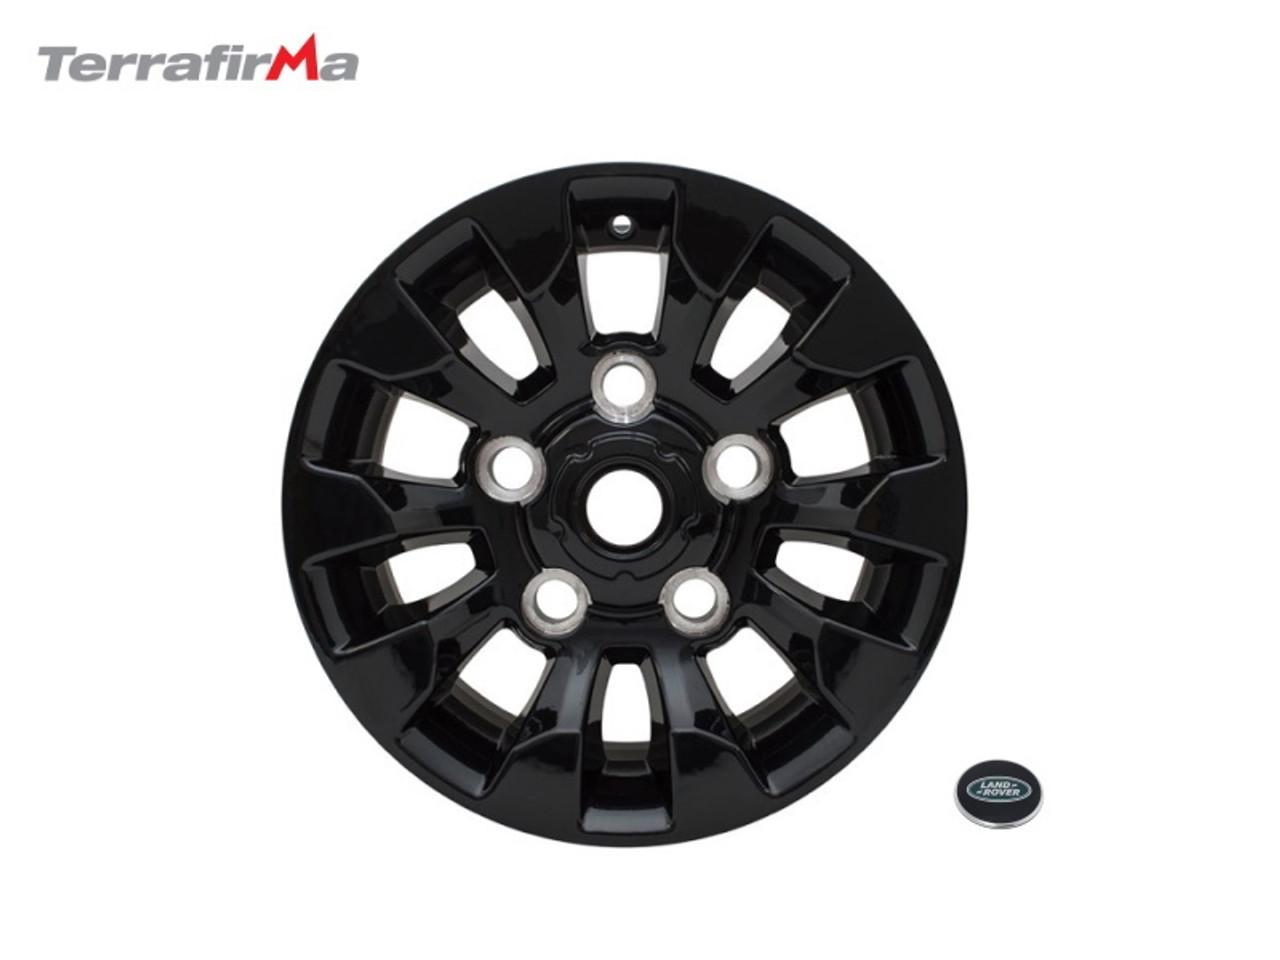 Terrafirma Defender 18x8 Gloss Black Iconic Alloy Wheel - DA6548